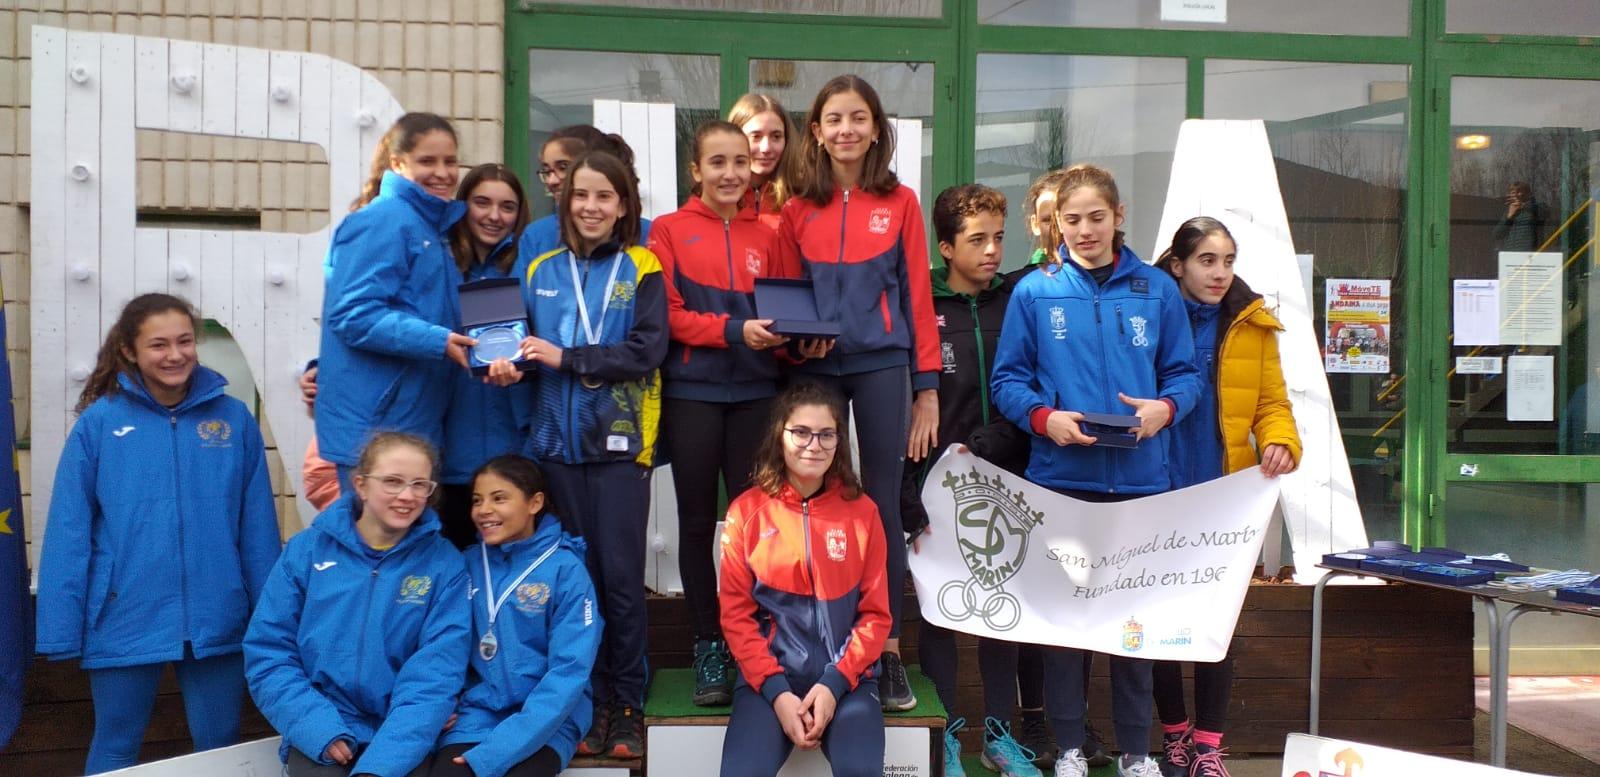 Gallego cross 2020 atletismo sub16